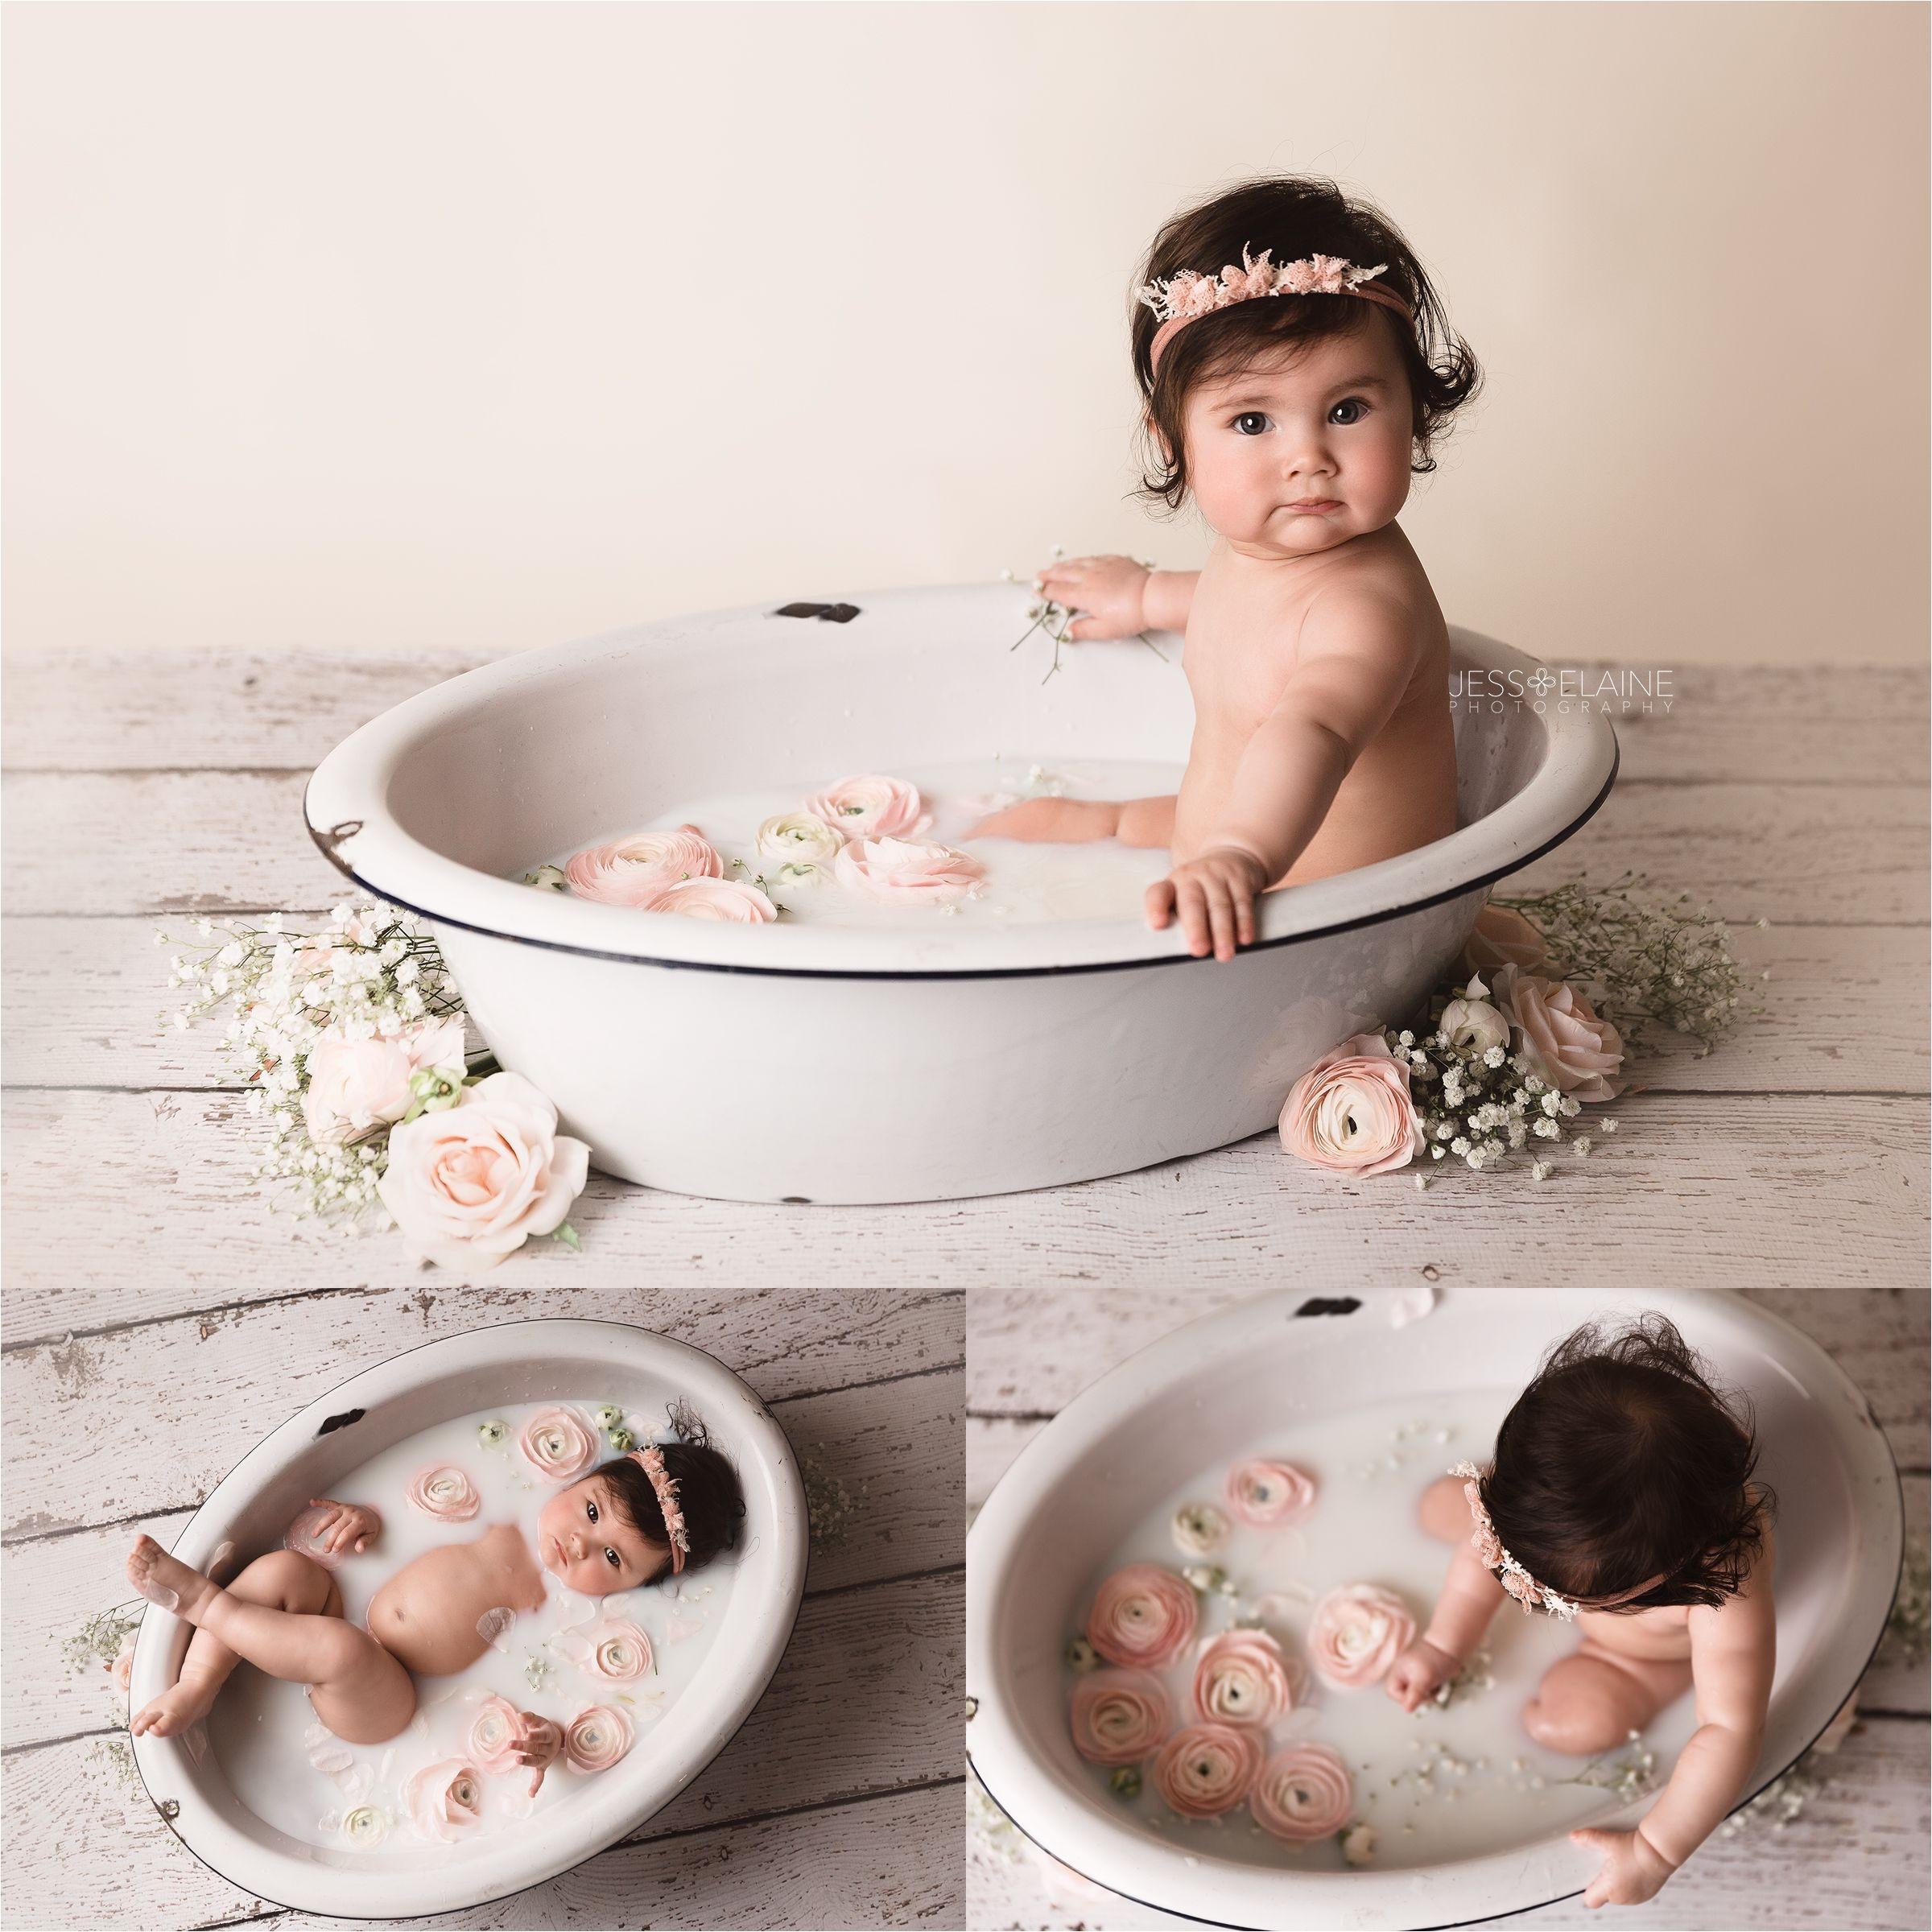 baby floral milk bath jess elaine photography